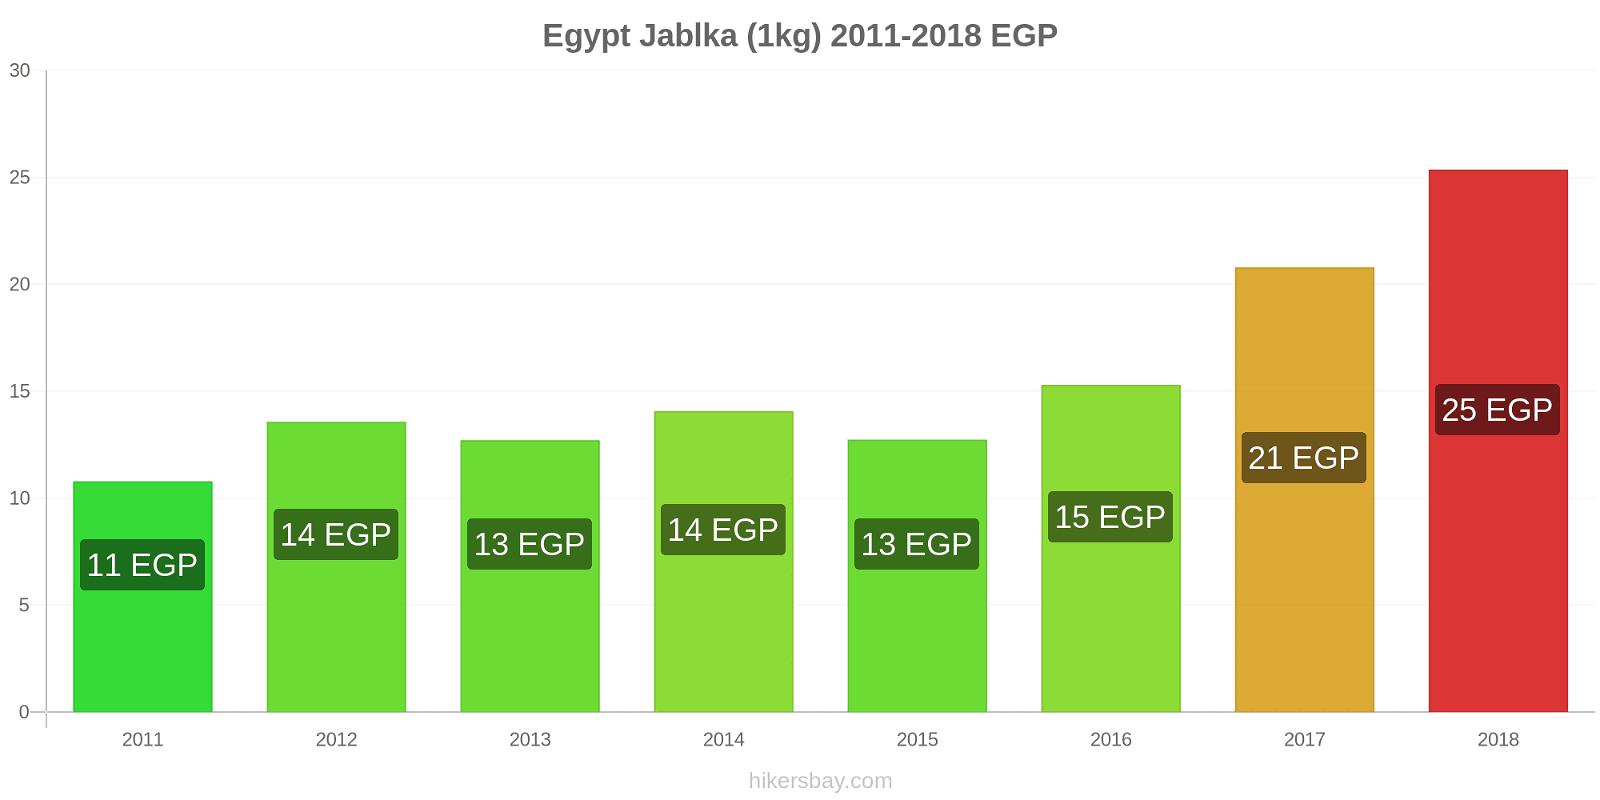 Egypt změny cen Jablka (1kg) hikersbay.com